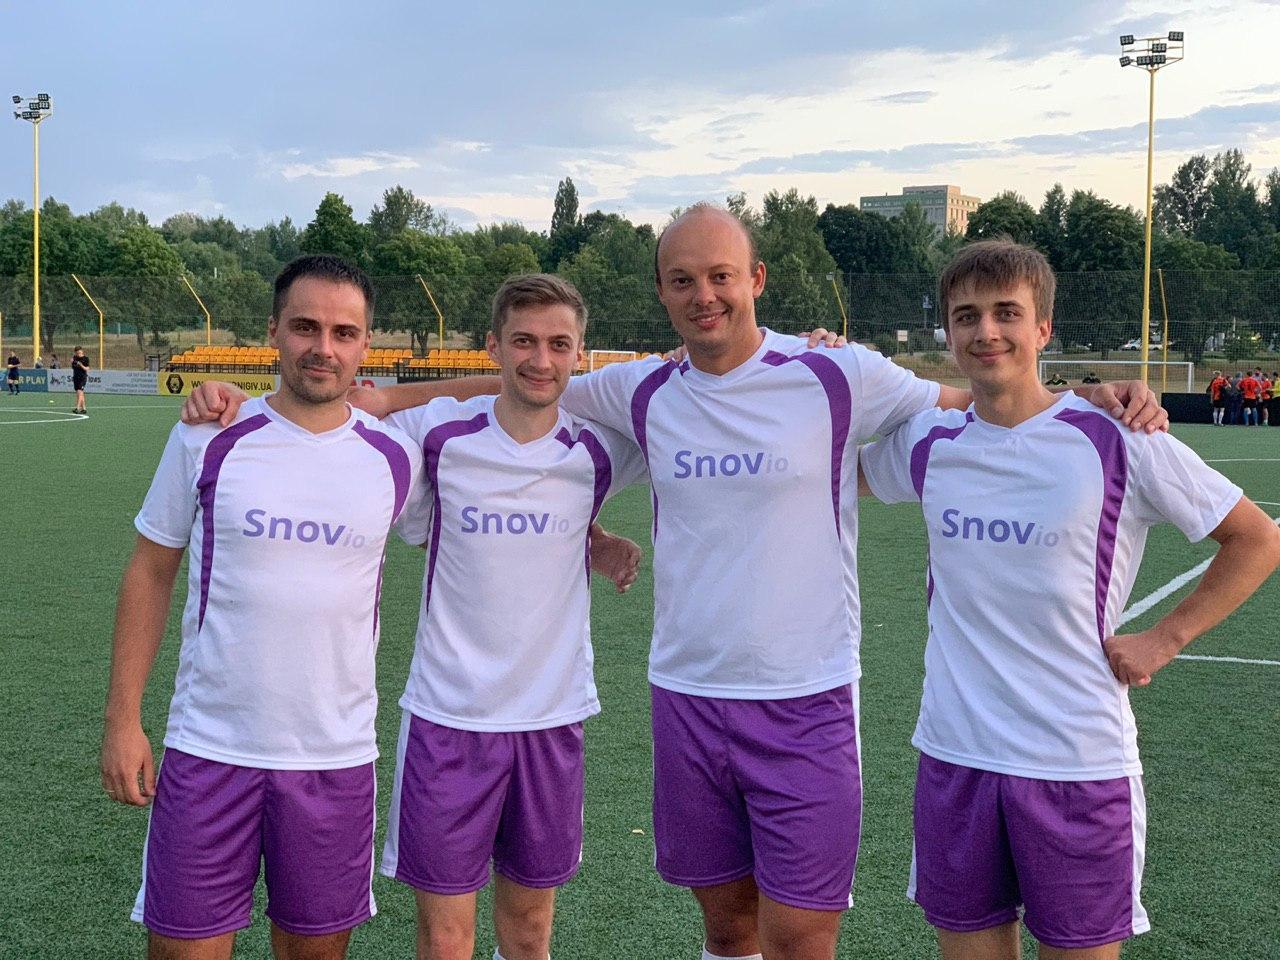 Snovio's football team